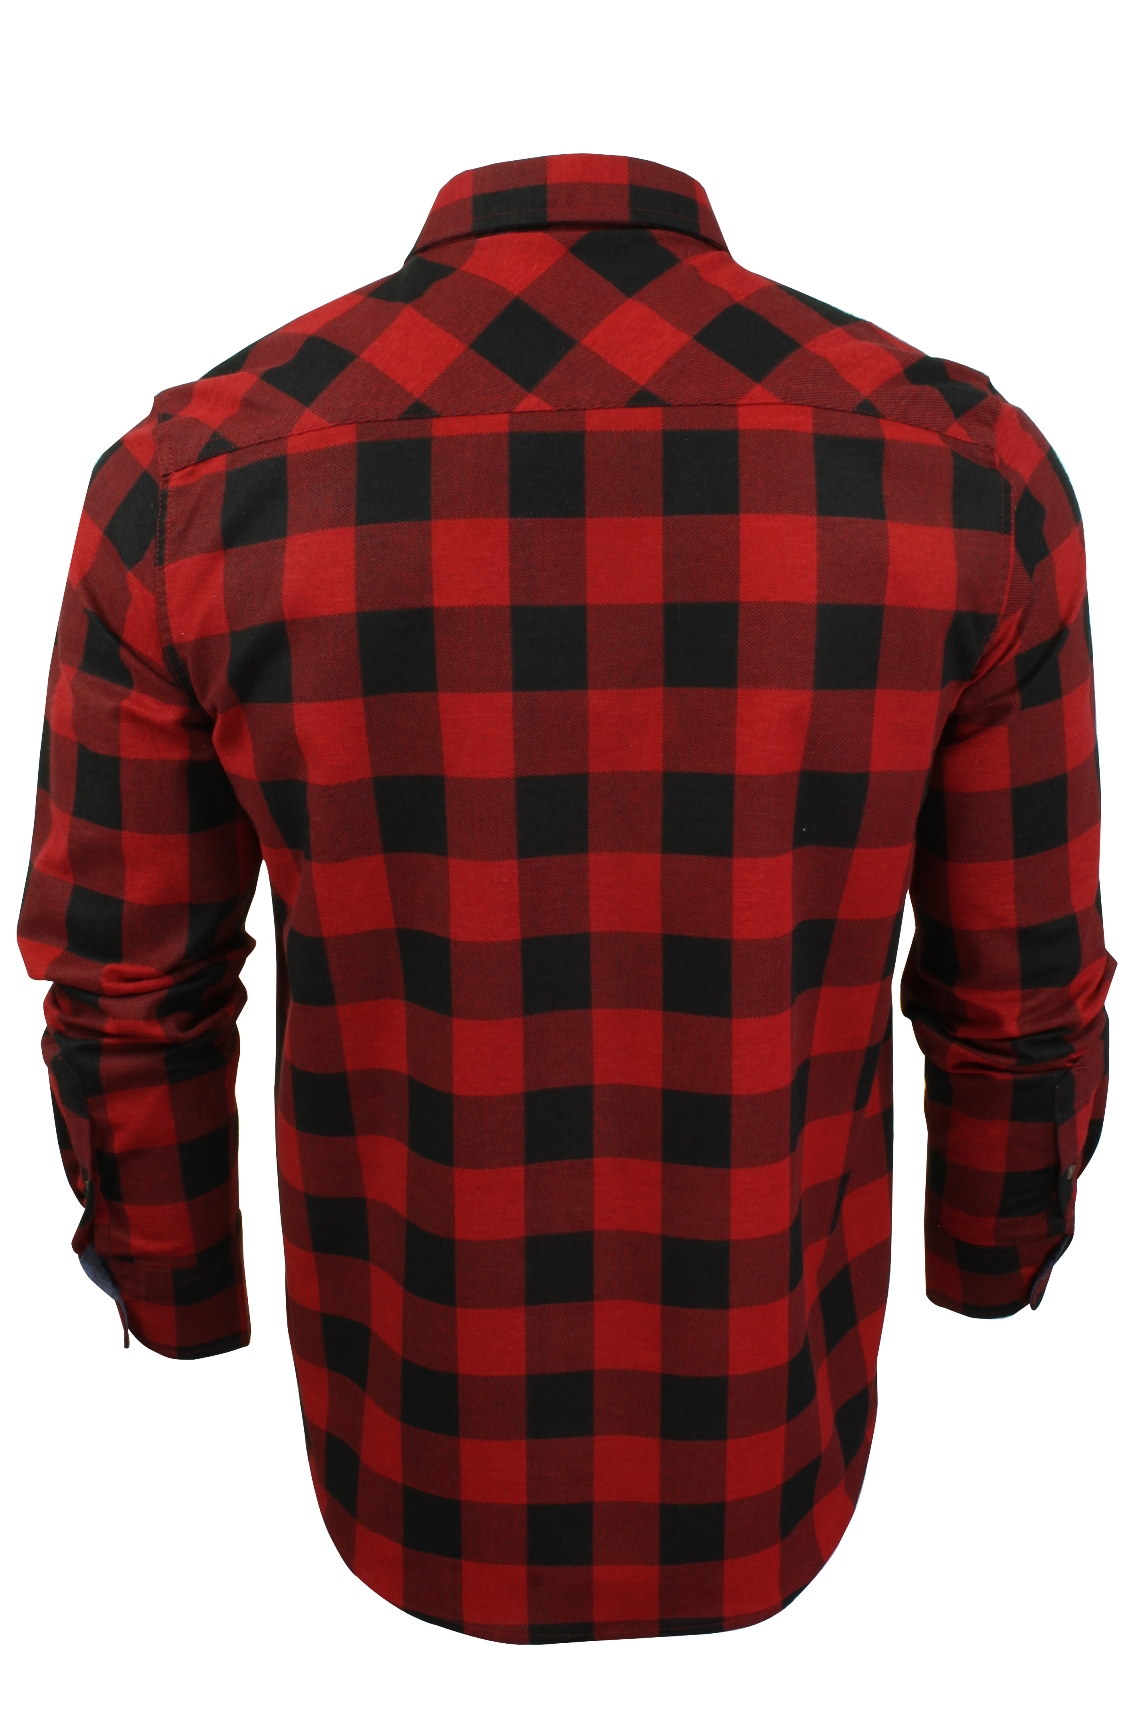 Brave-Soul-Brushed-Flannel-Check-Cotton-Jack-Shirt-Long-Sleeved thumbnail 21